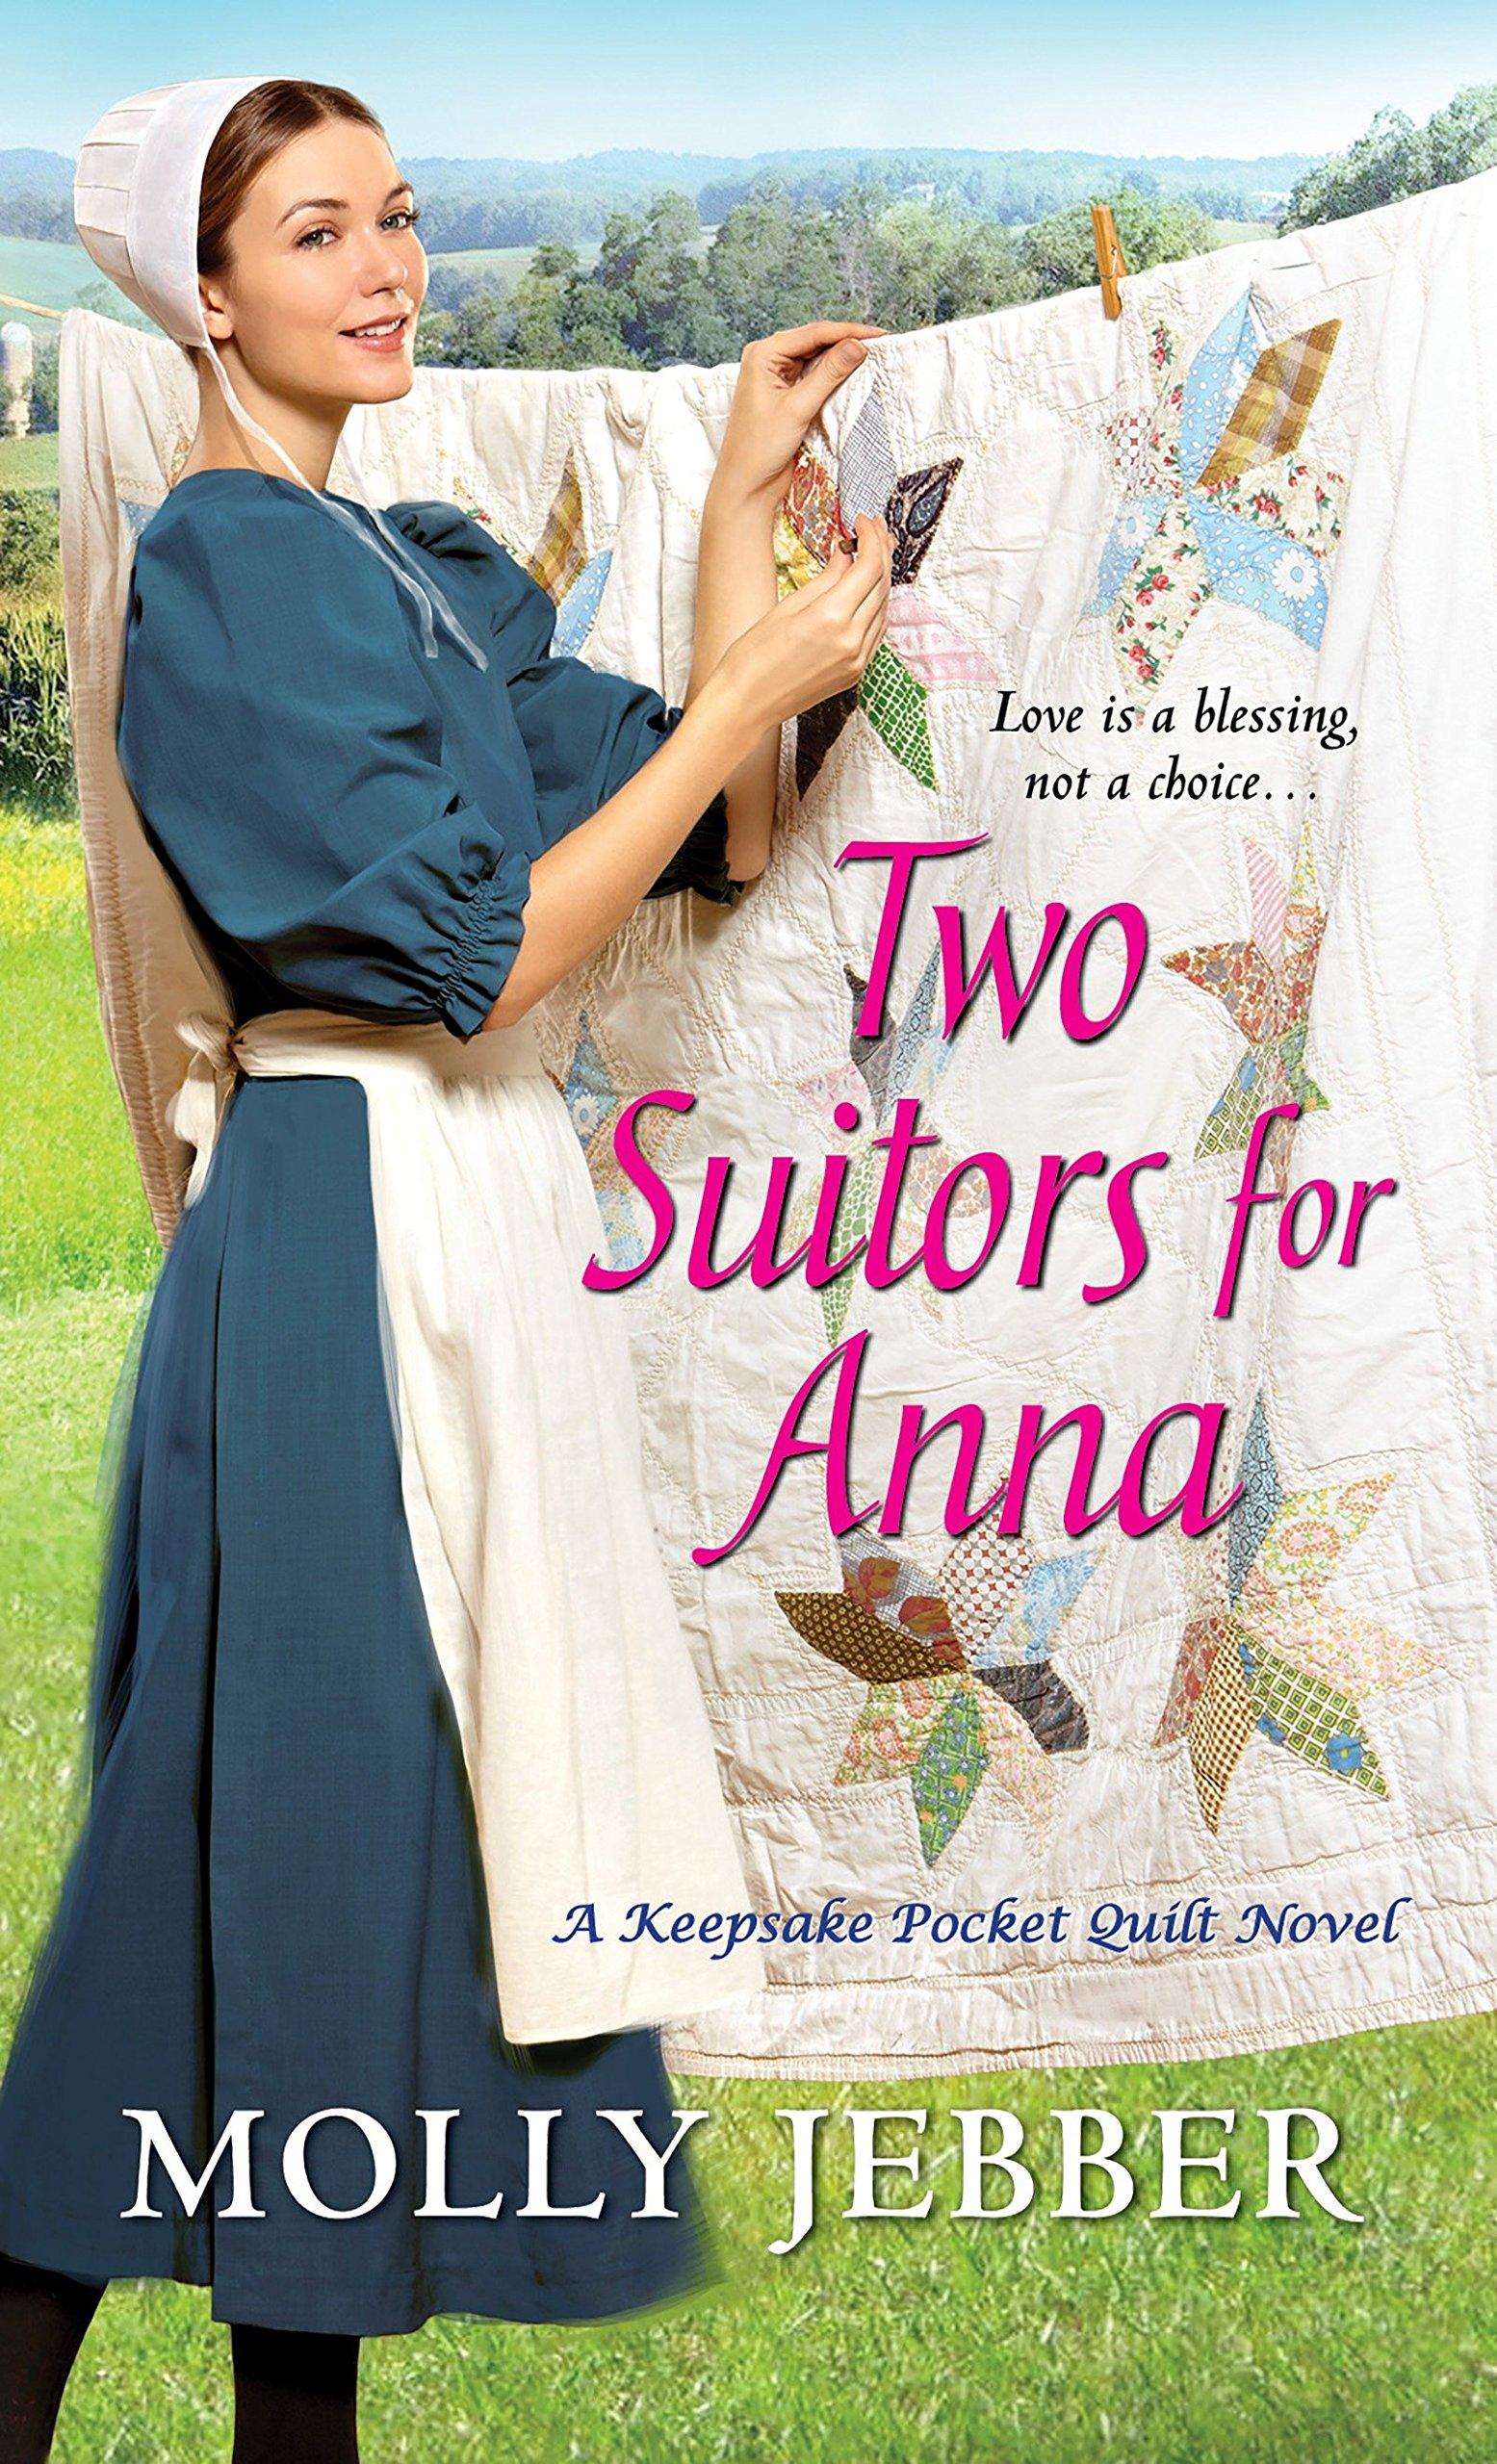 Two Suitors for Anna (A Keepsake Pocket Quilt Novel) PDF